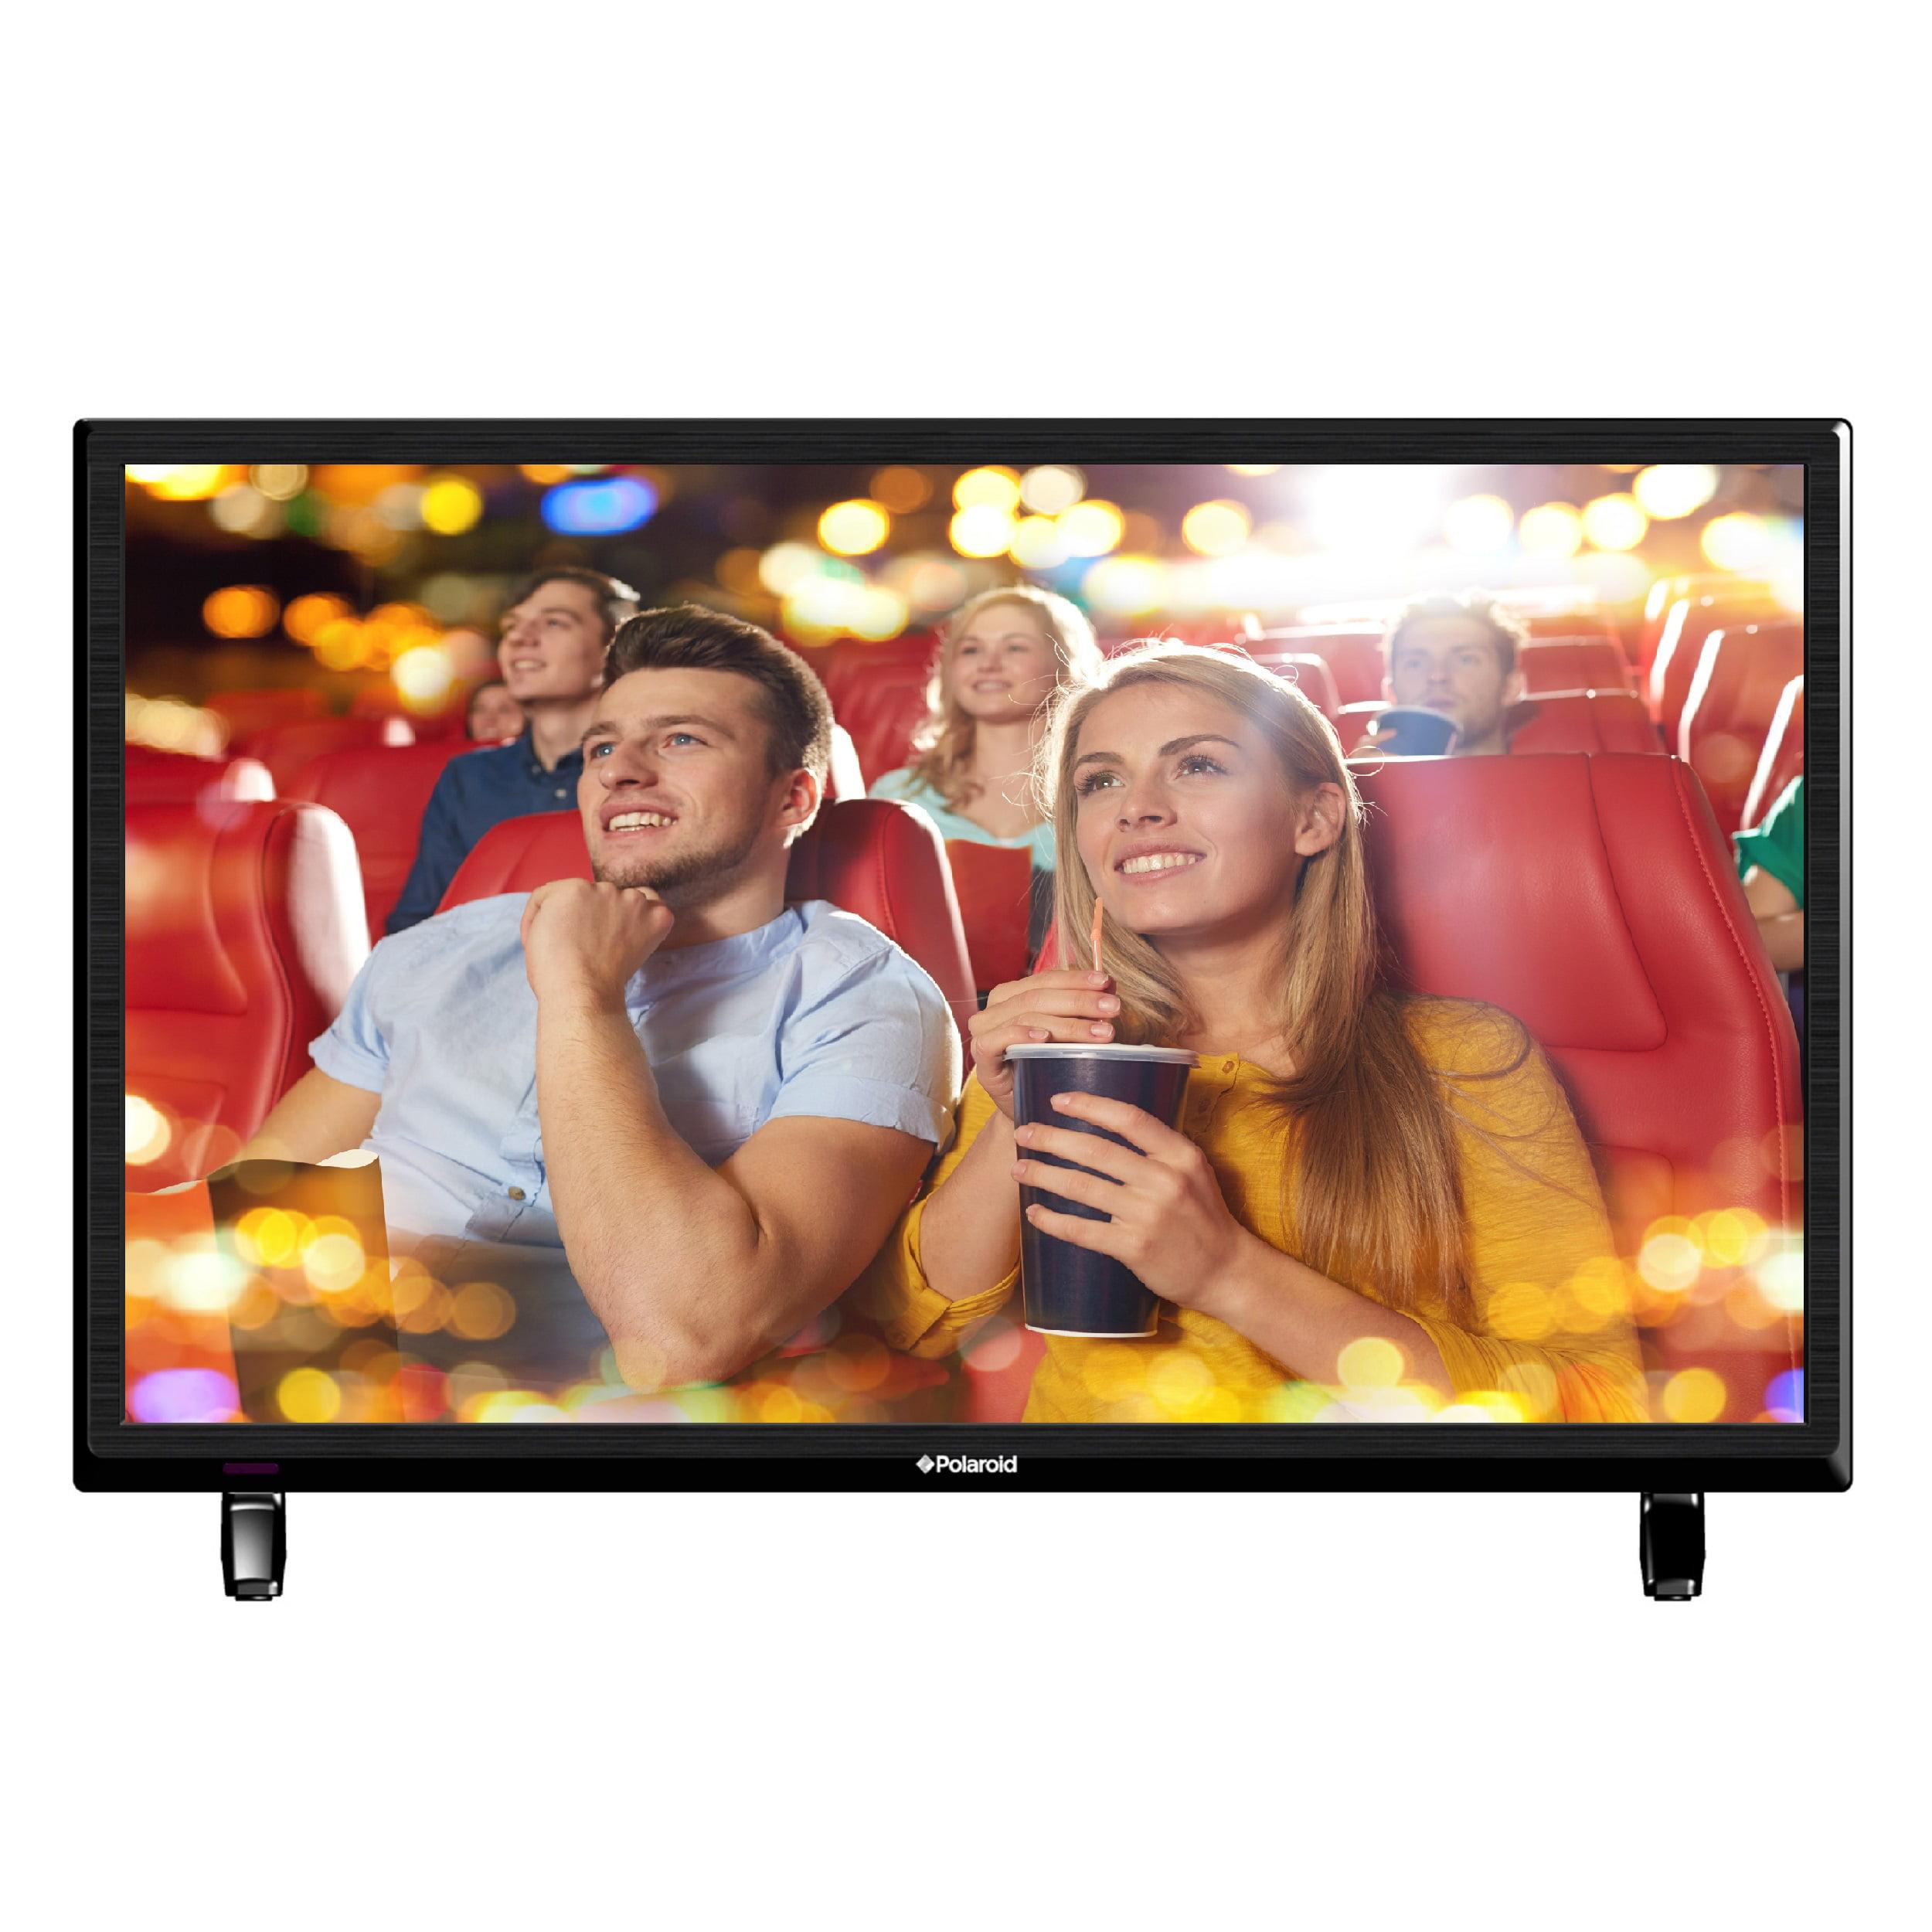 "Polaroid 32"" Class HD (720P) Smart LED TV (32T2H) - Best Reviews Guide"